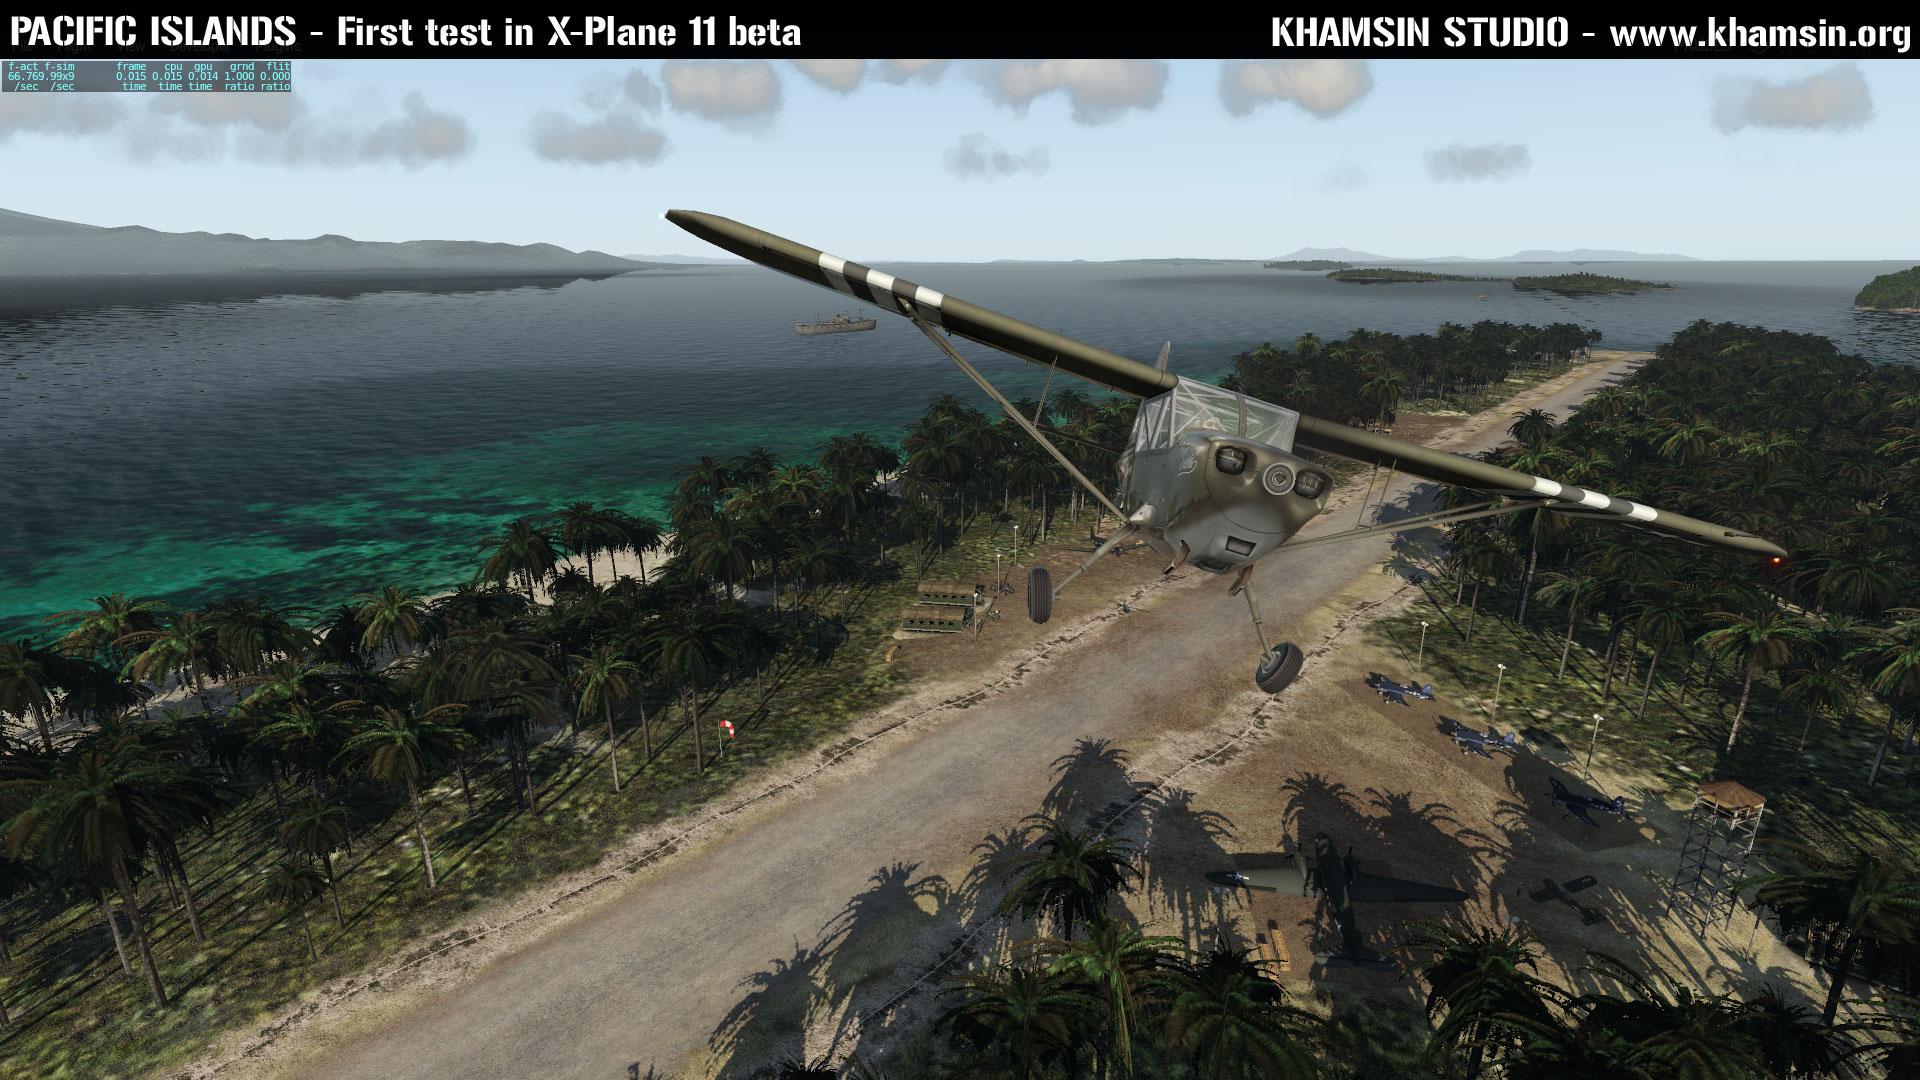 Mot-clé - Pacific islands - blog khamsin org